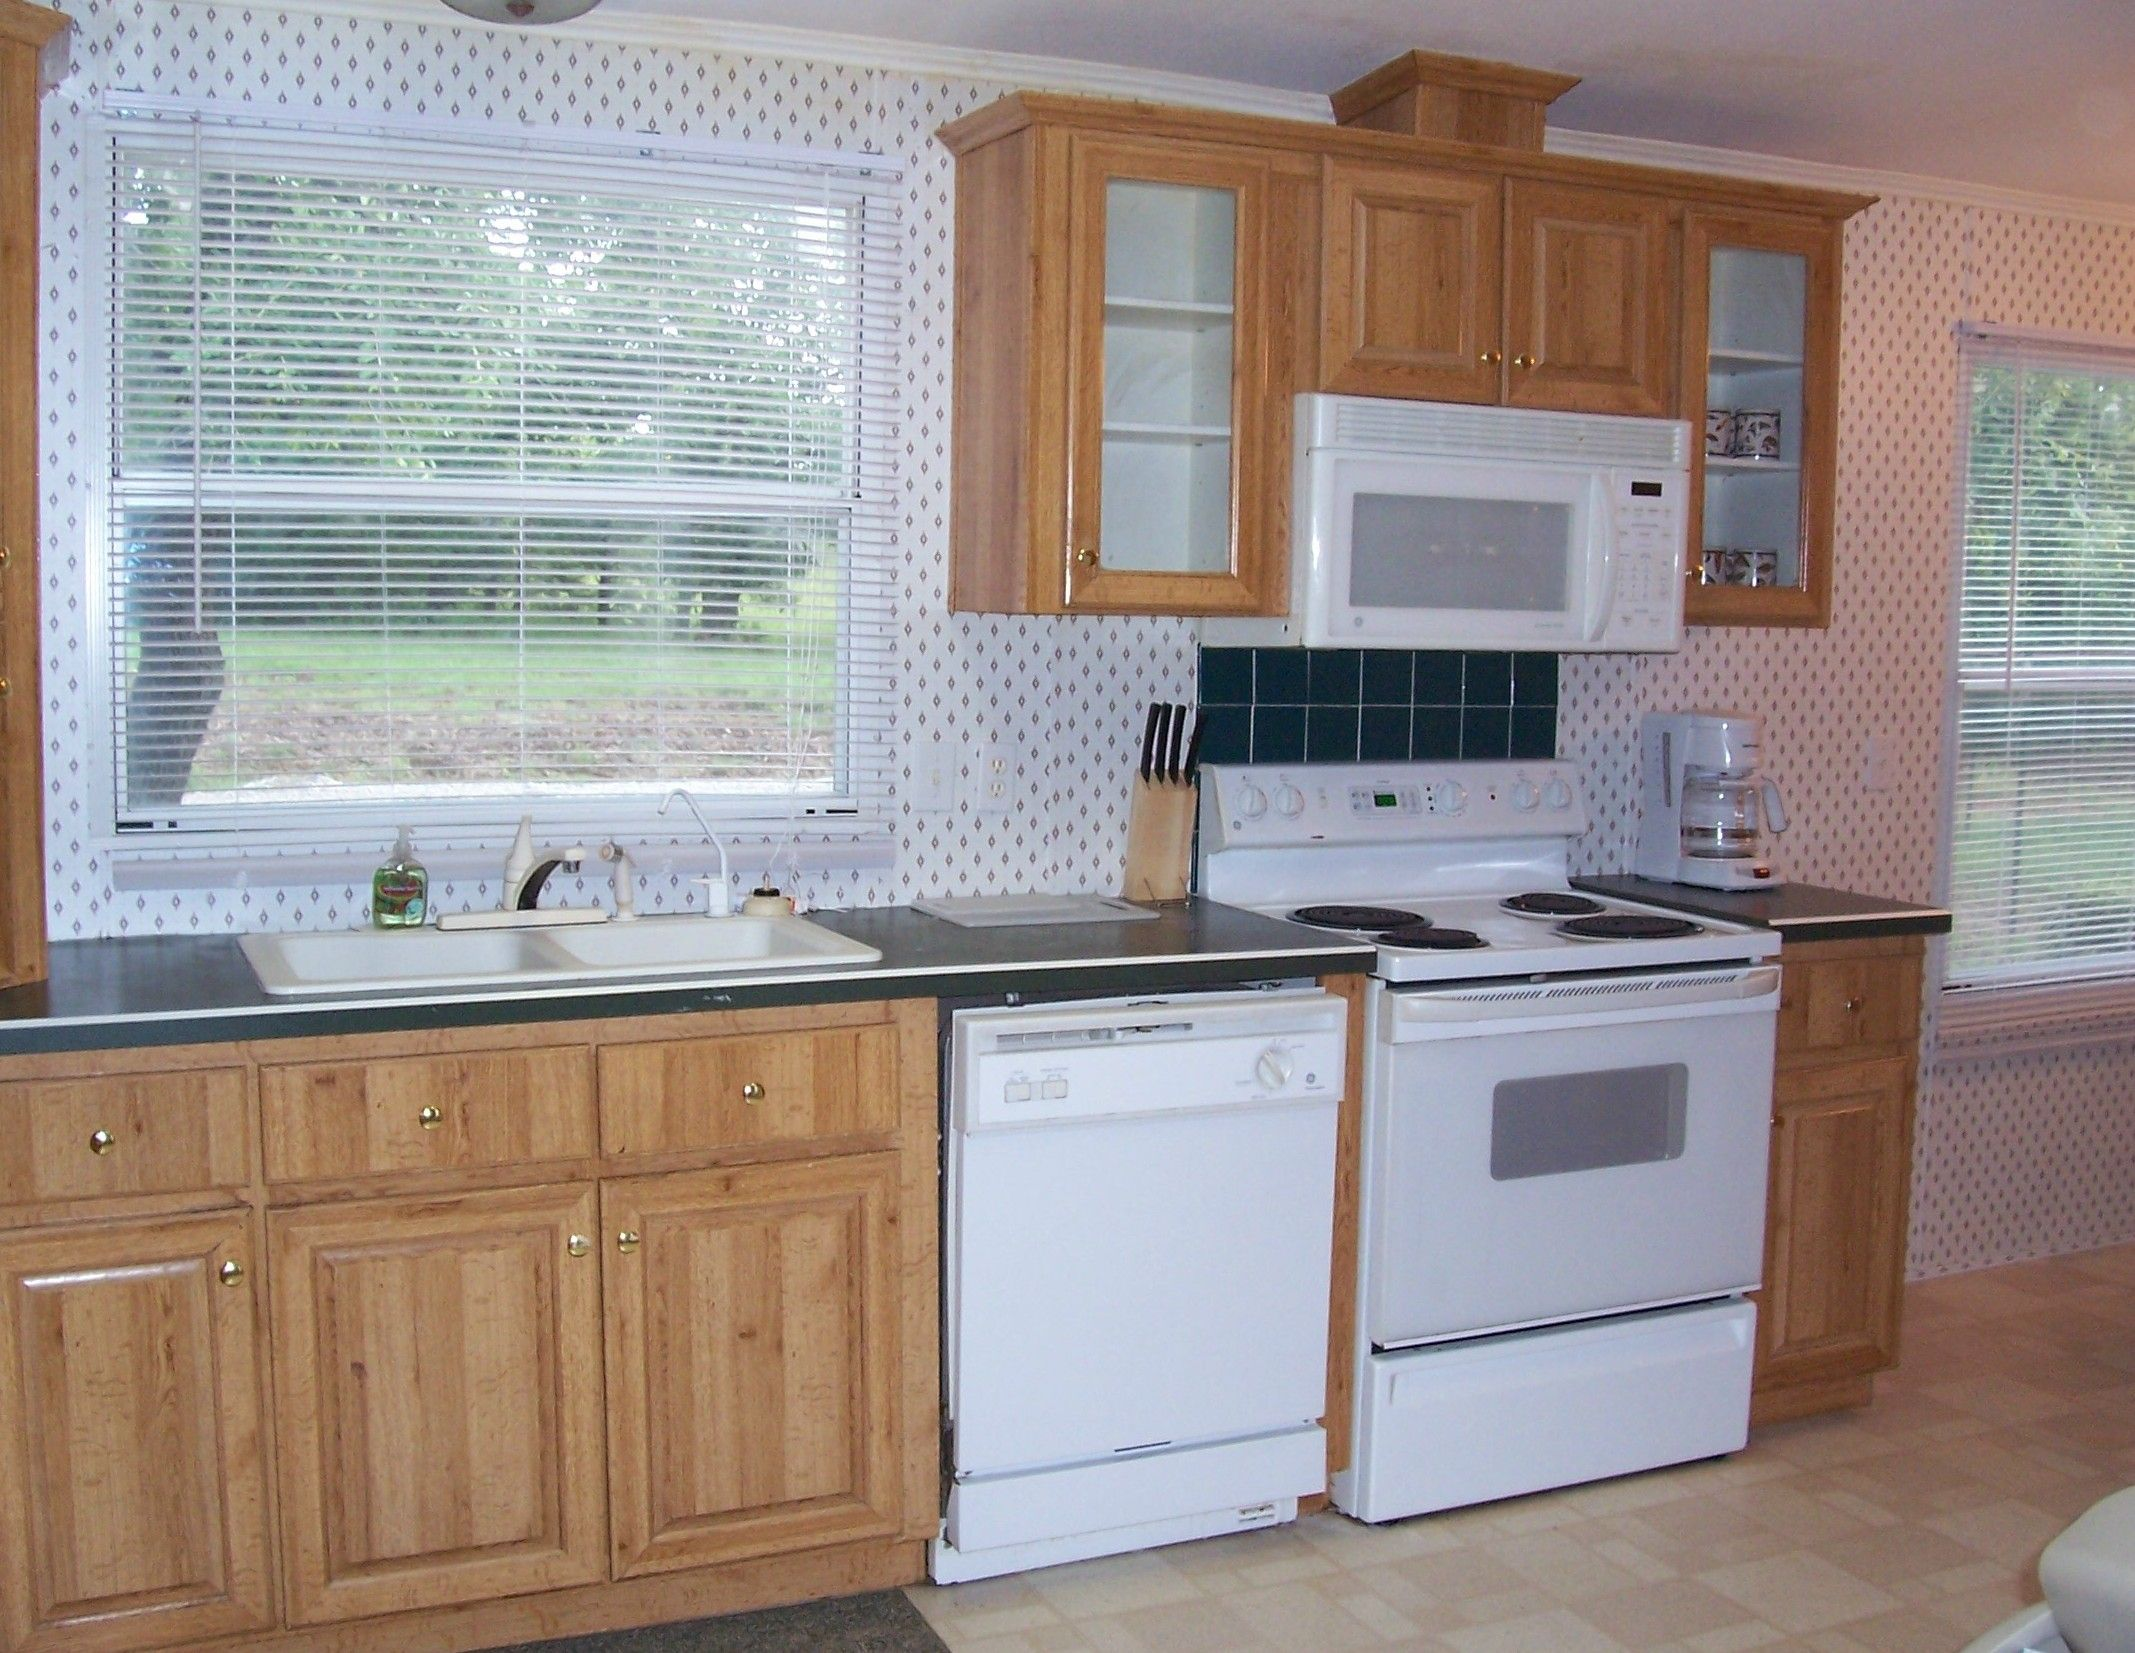 Dishwasher Next To Stove Kitchen Design Kitchen Kitchen Layout